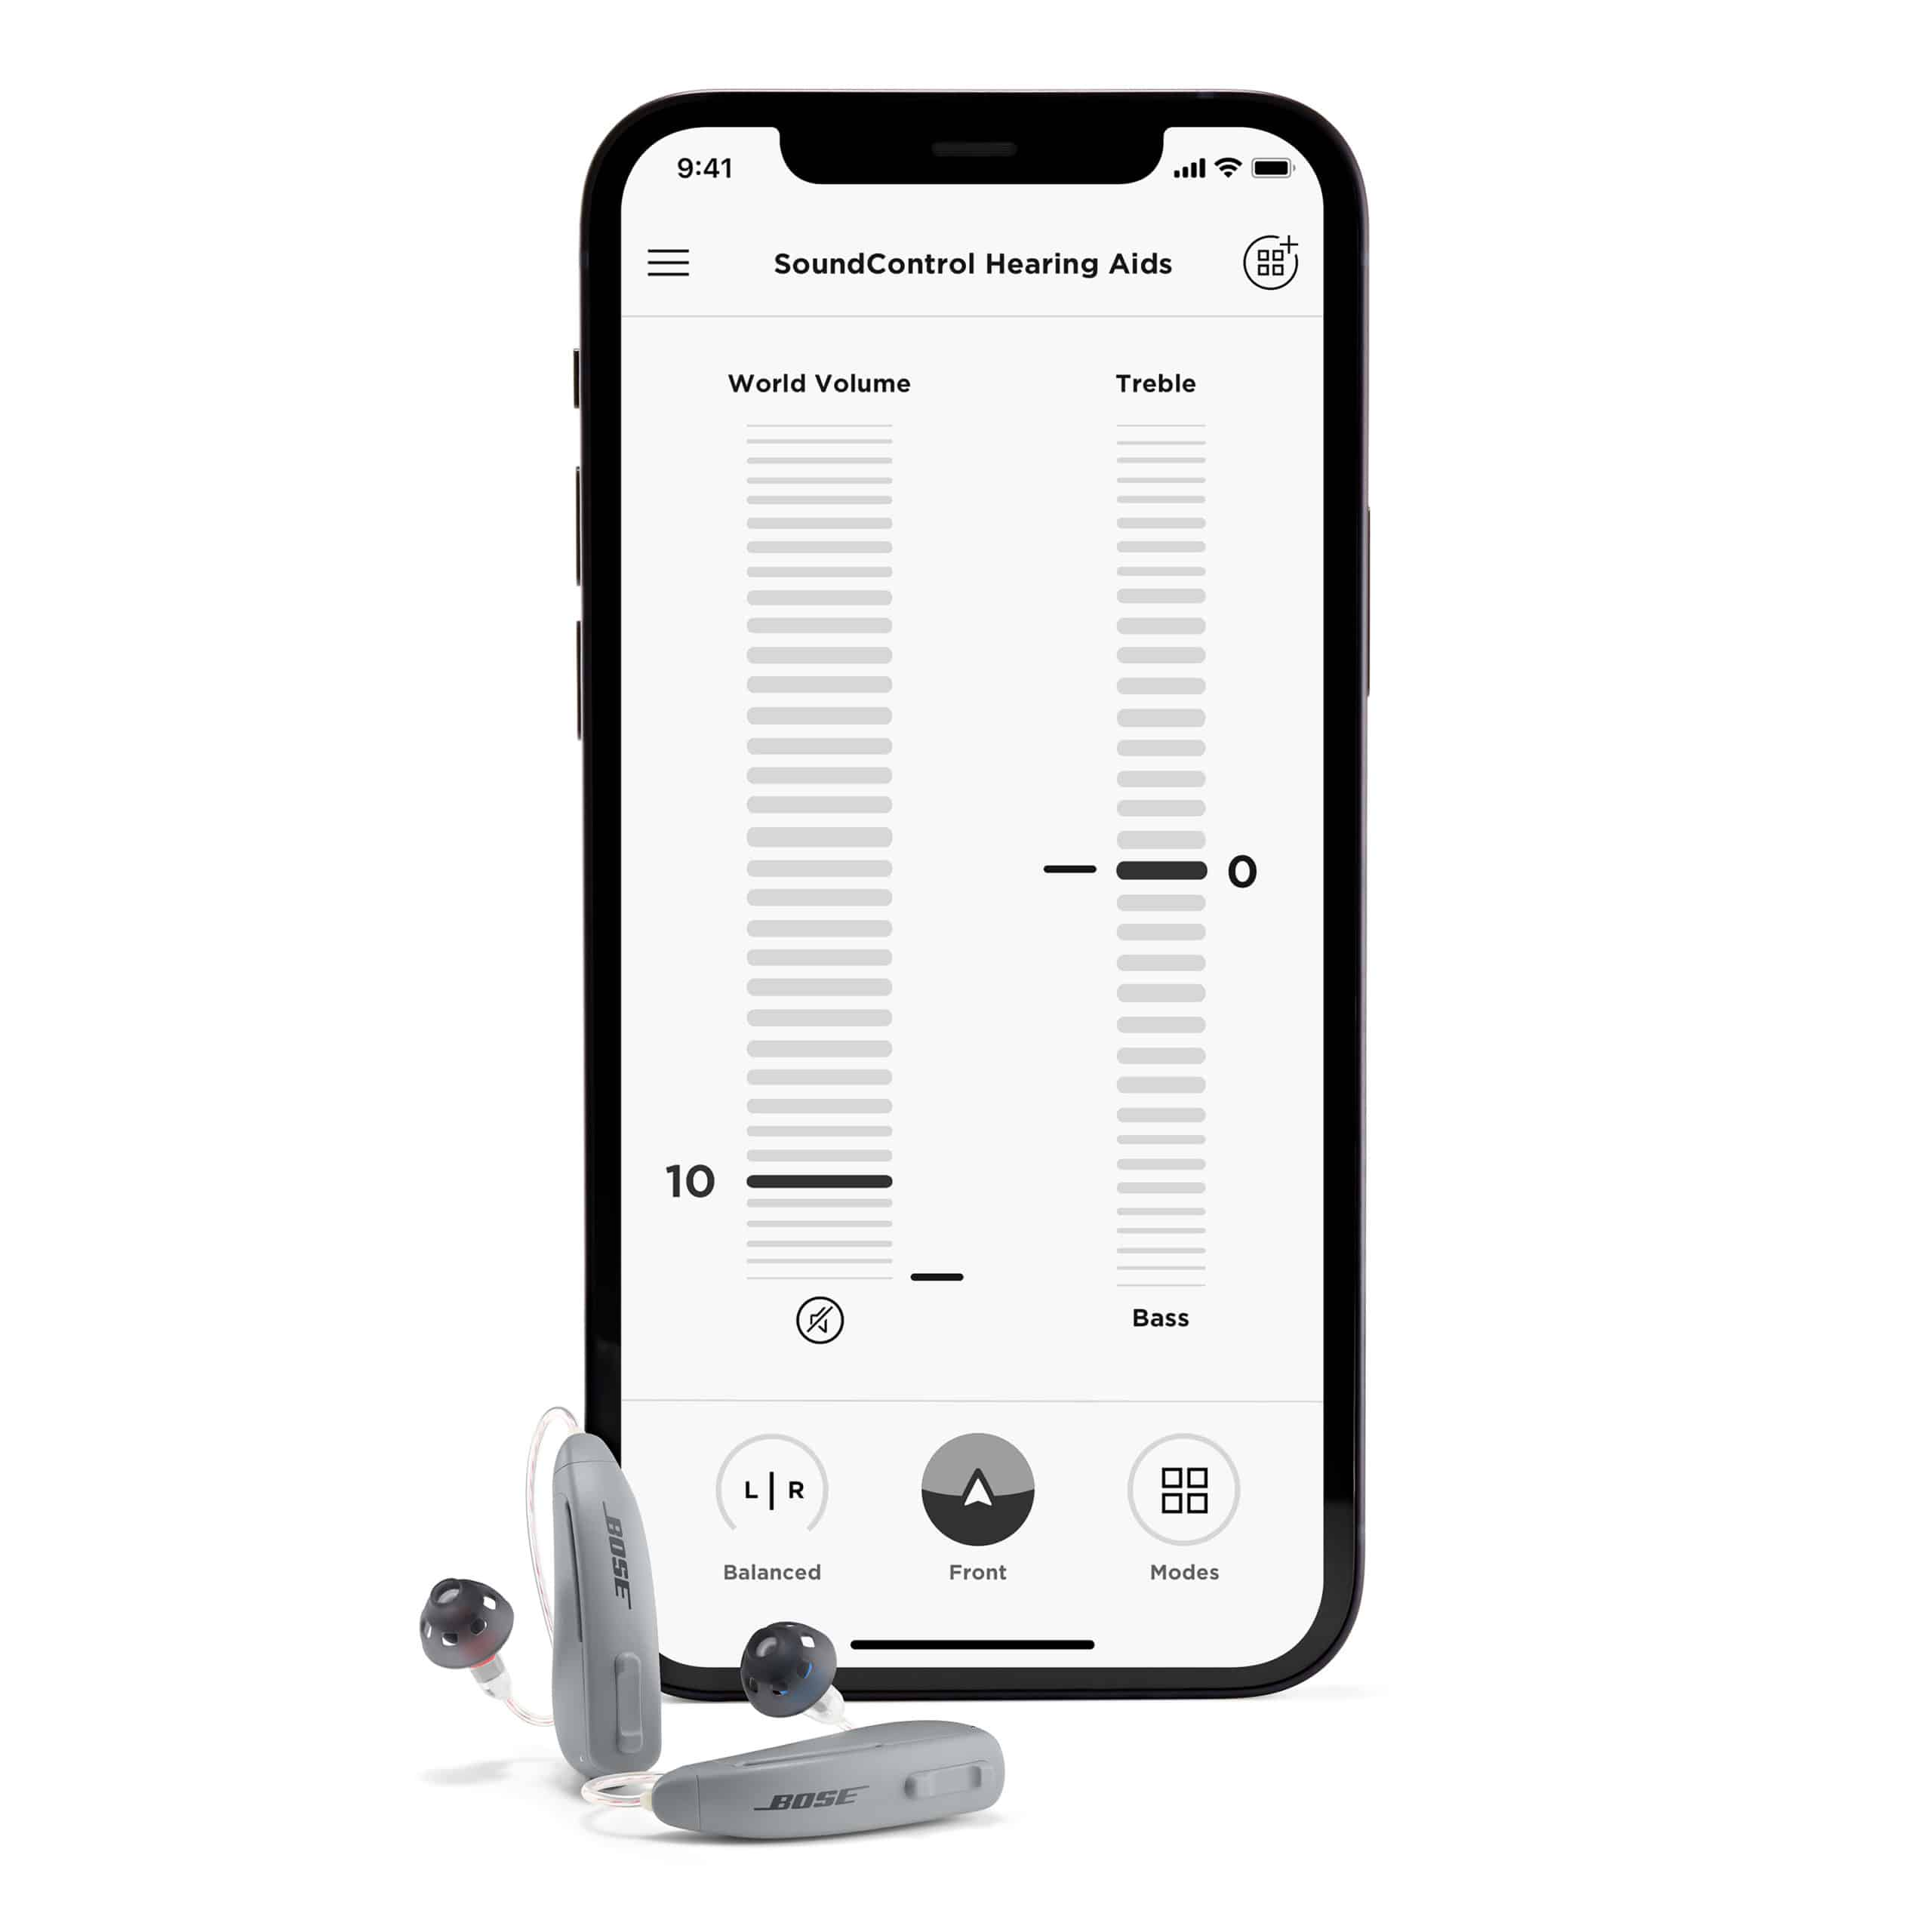 Bose Hear App controls.